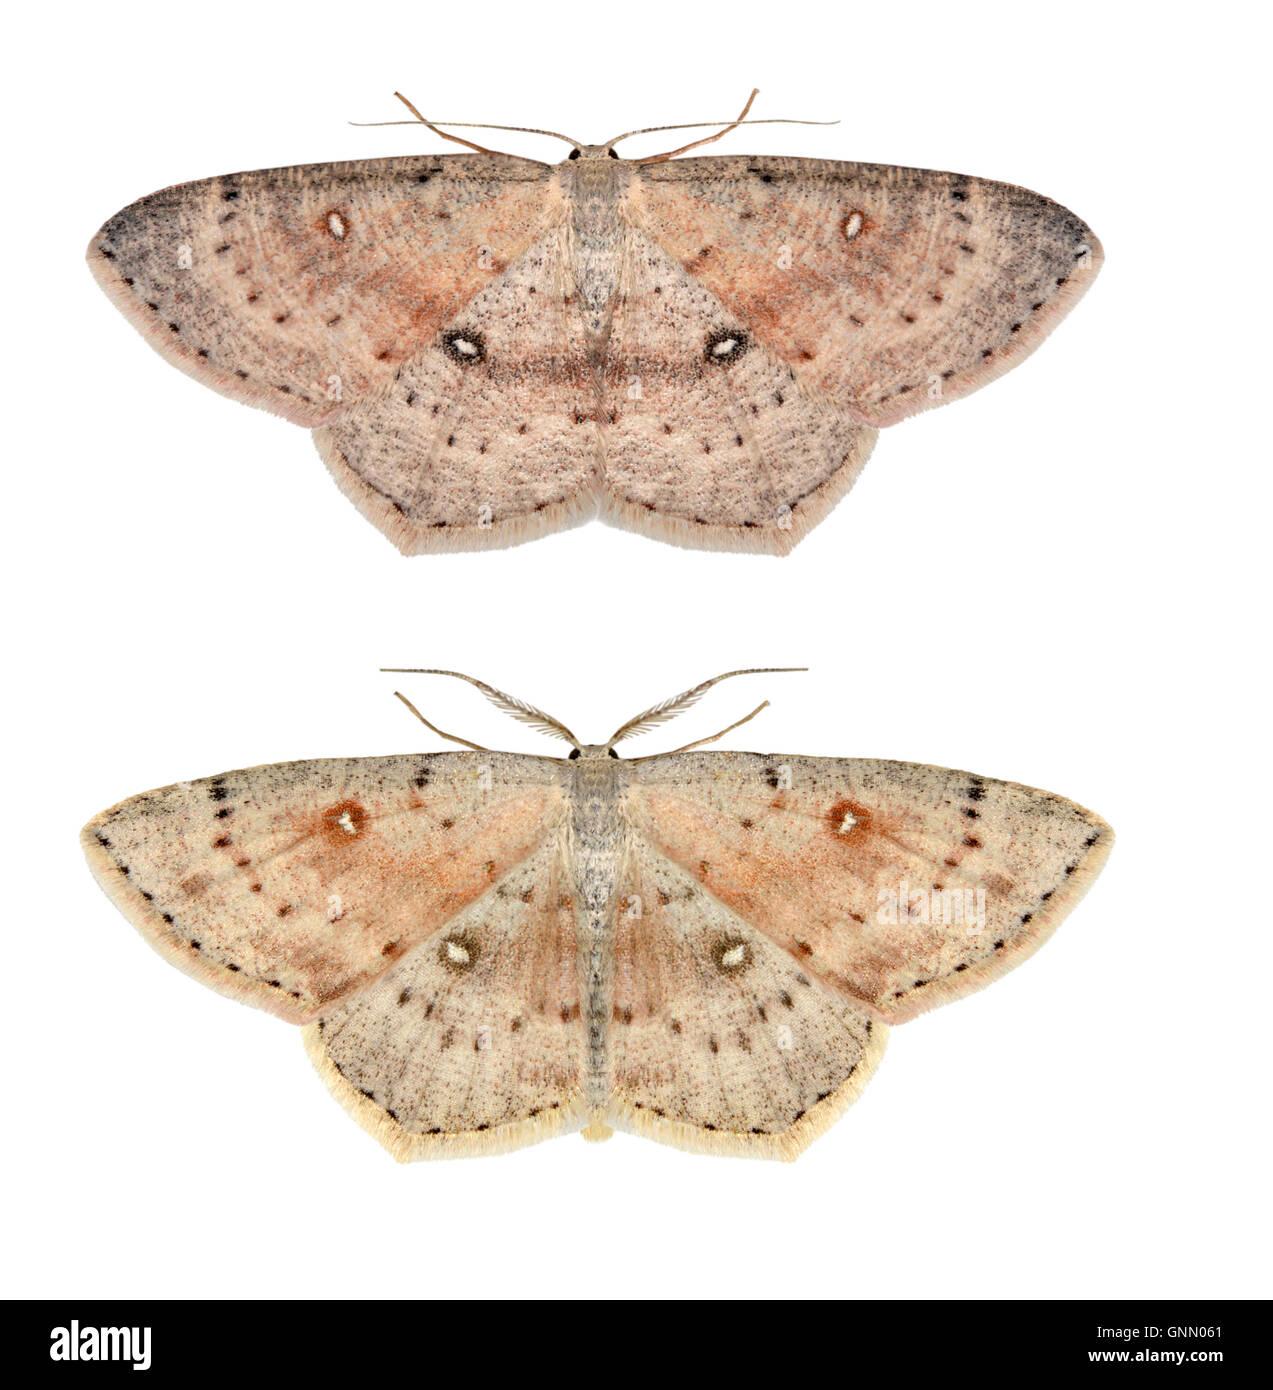 70.032 (1677) Birch Mocha - Cyclophora albipunctata - Stock Image